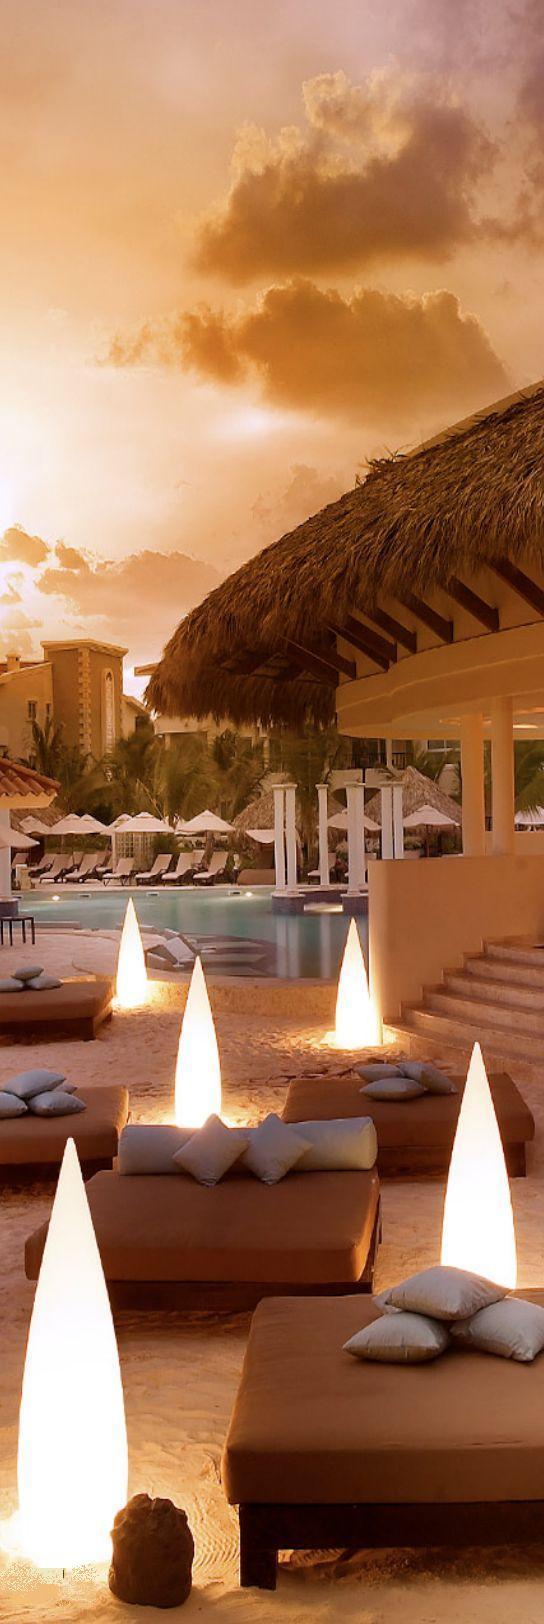 he Gabi Lounge - Punta Cana